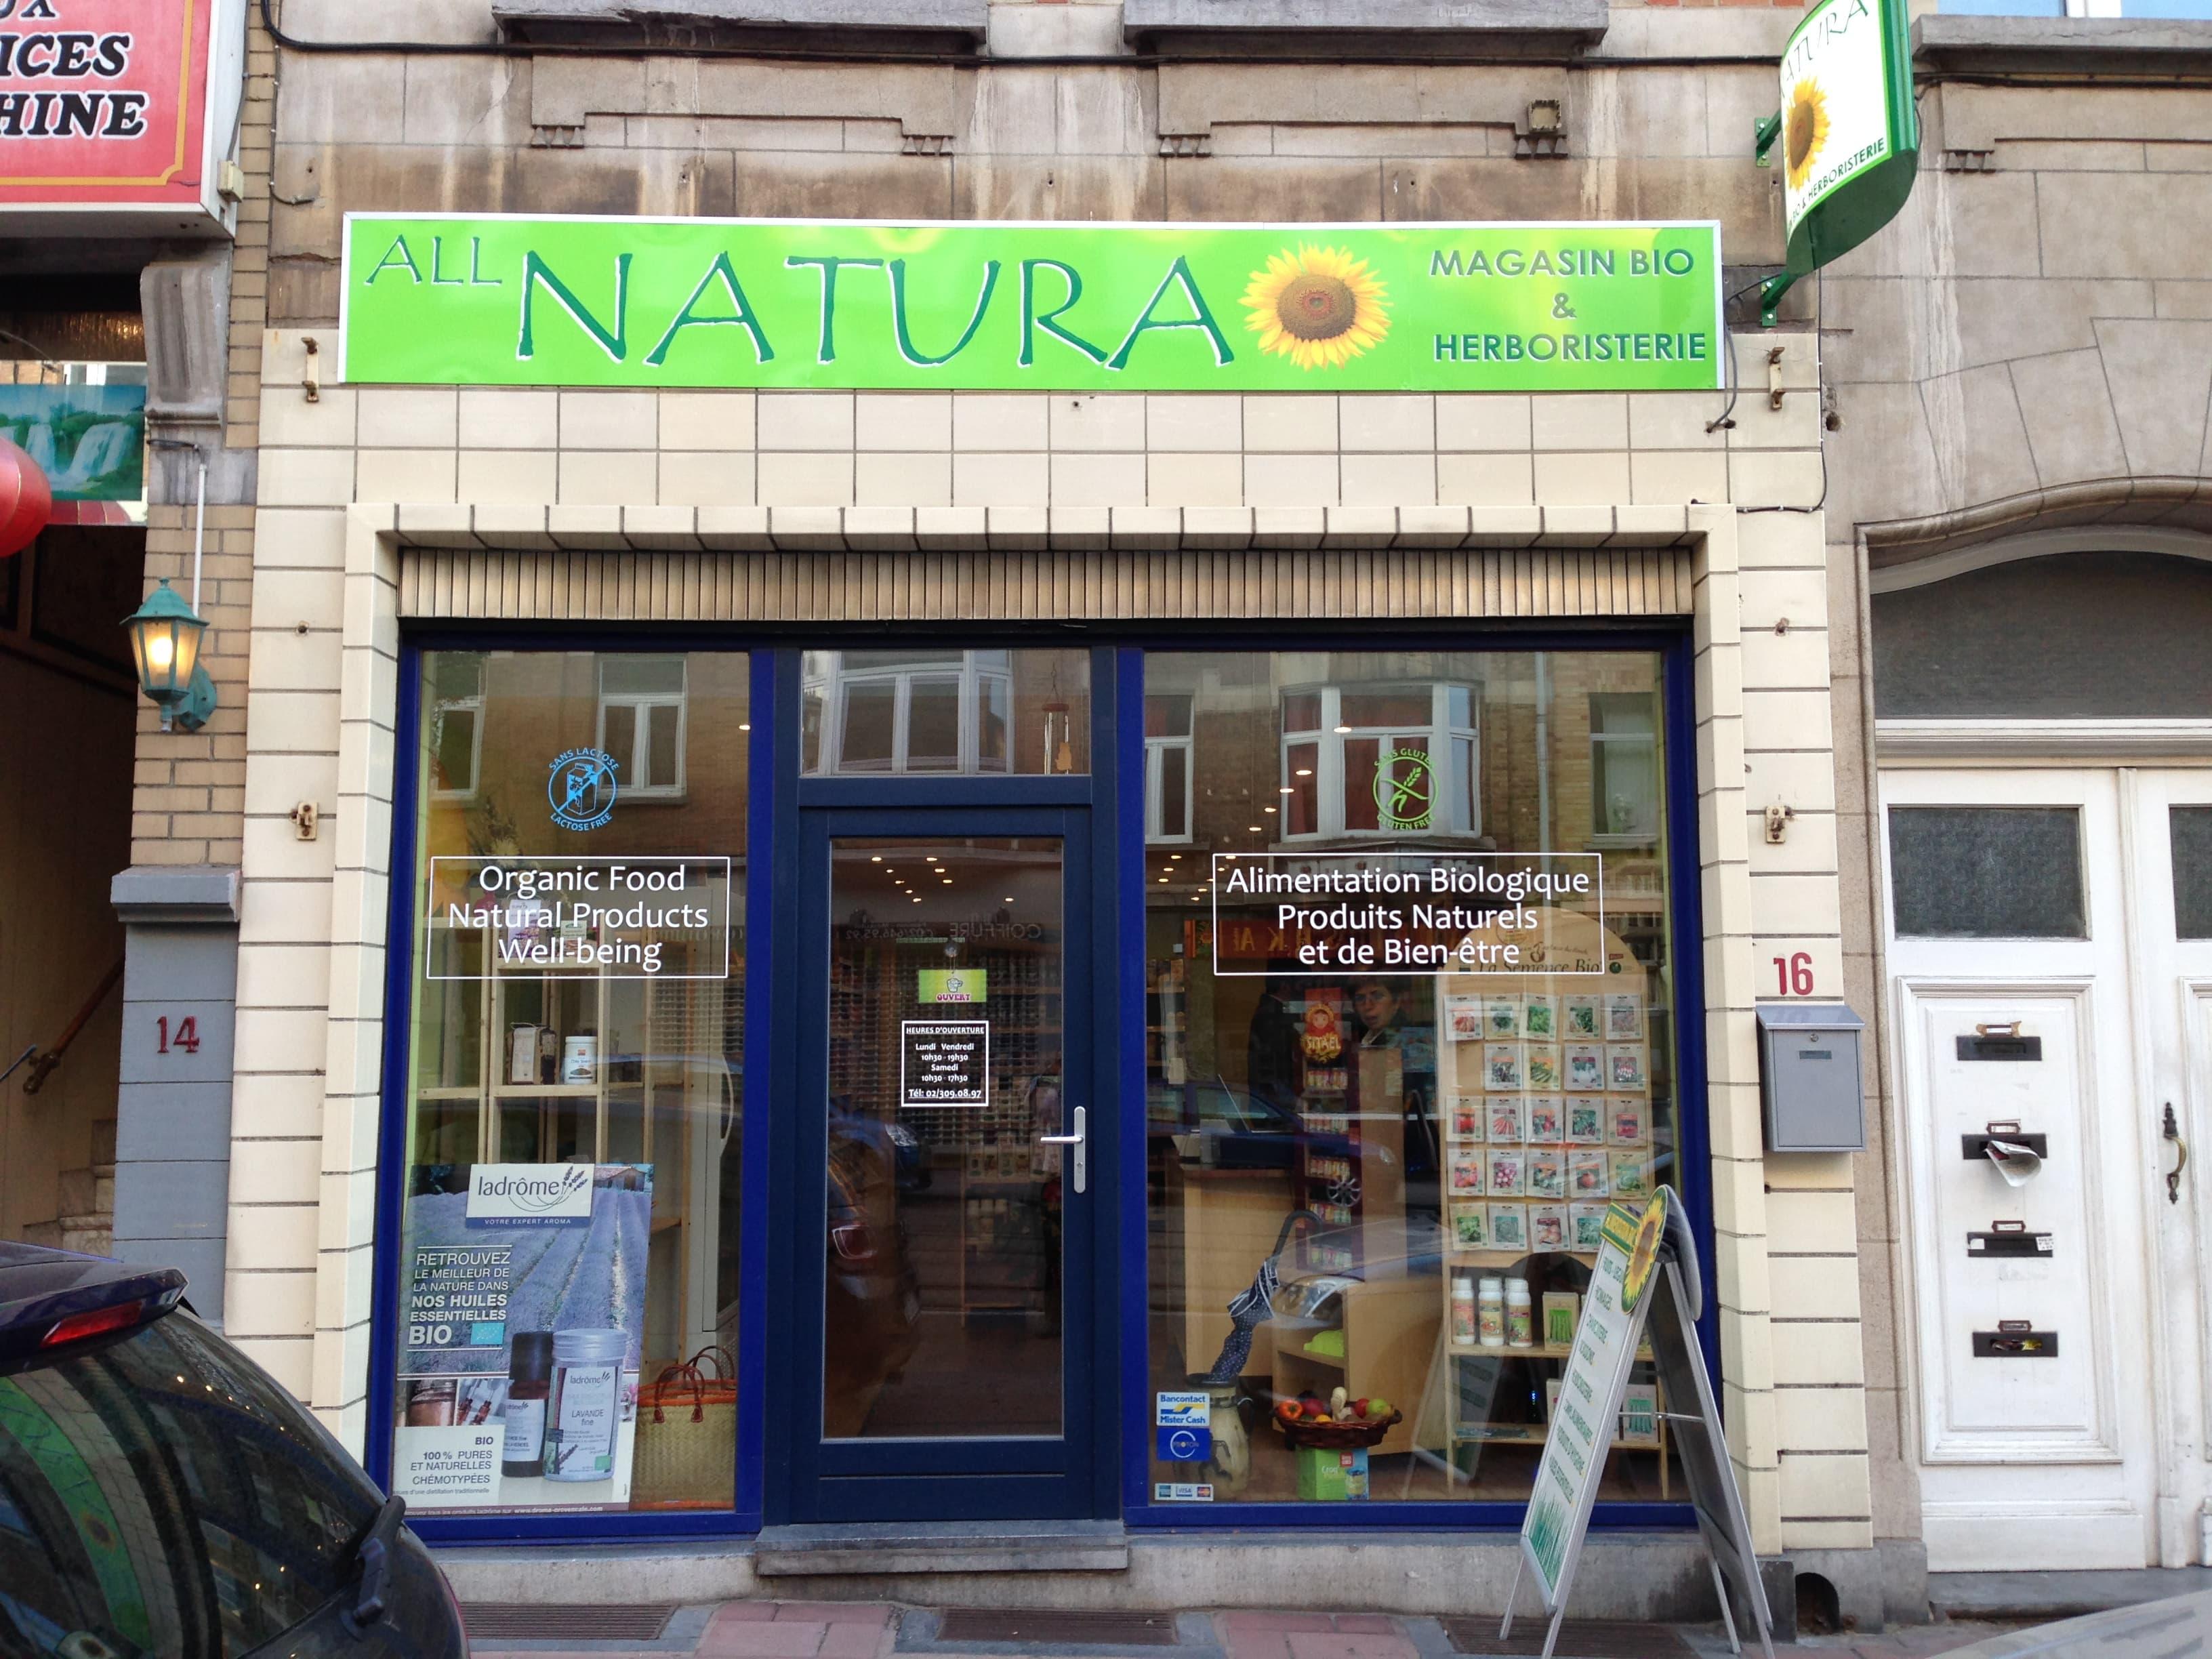 02e5b15c716 All Natura  magasin nourriture biologique